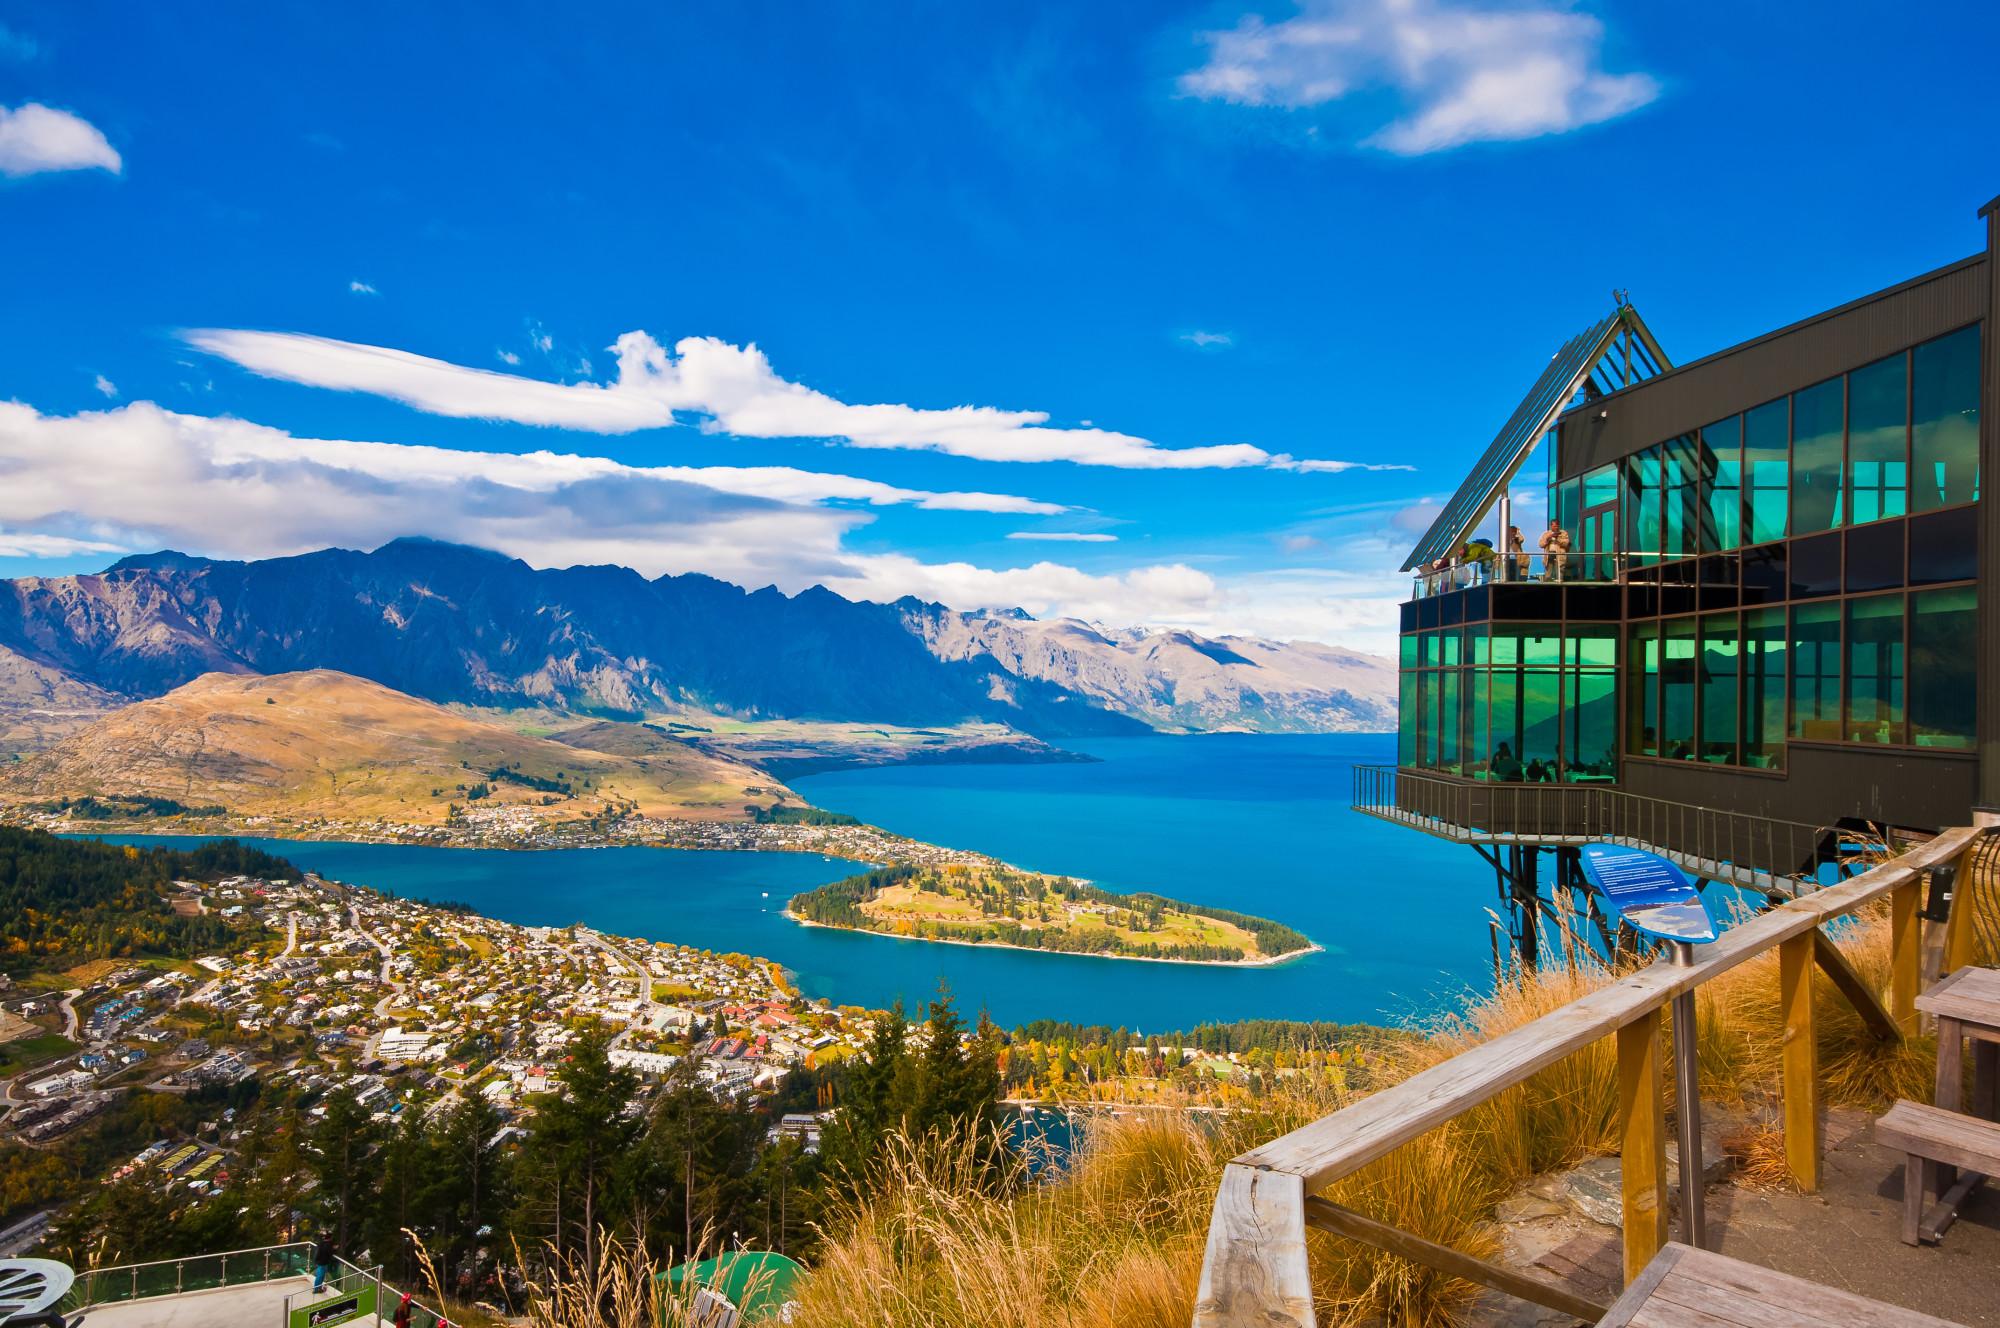 Top 7 Best Places to Eat in Queenstown, New Zealand